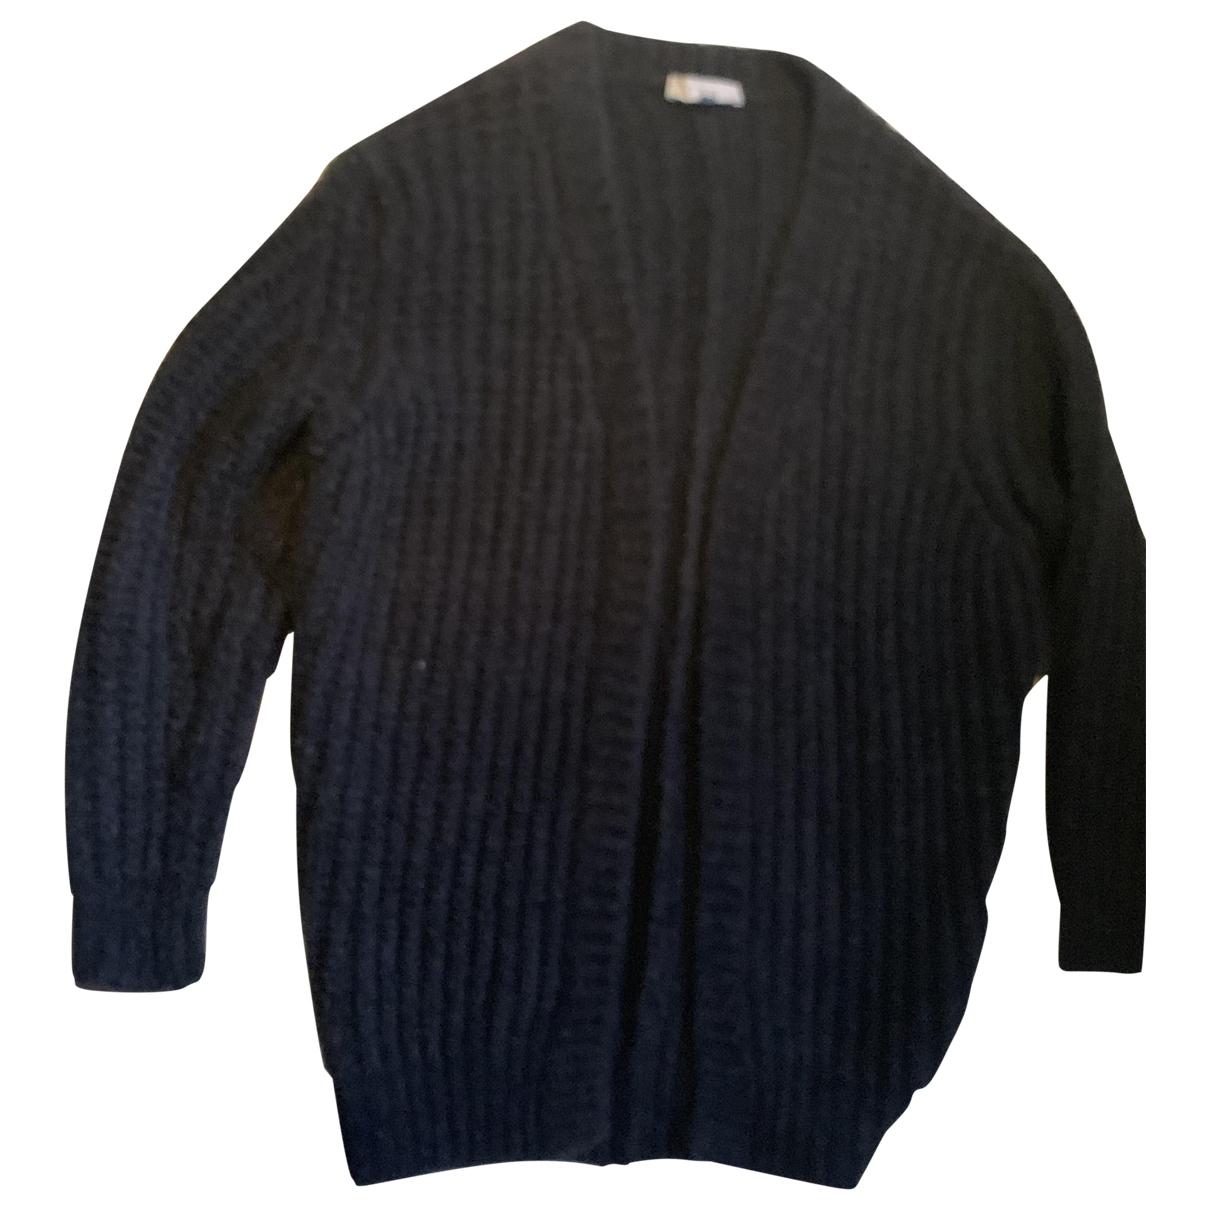 Iro \N Anthracite Wool Knitwear for Women S International